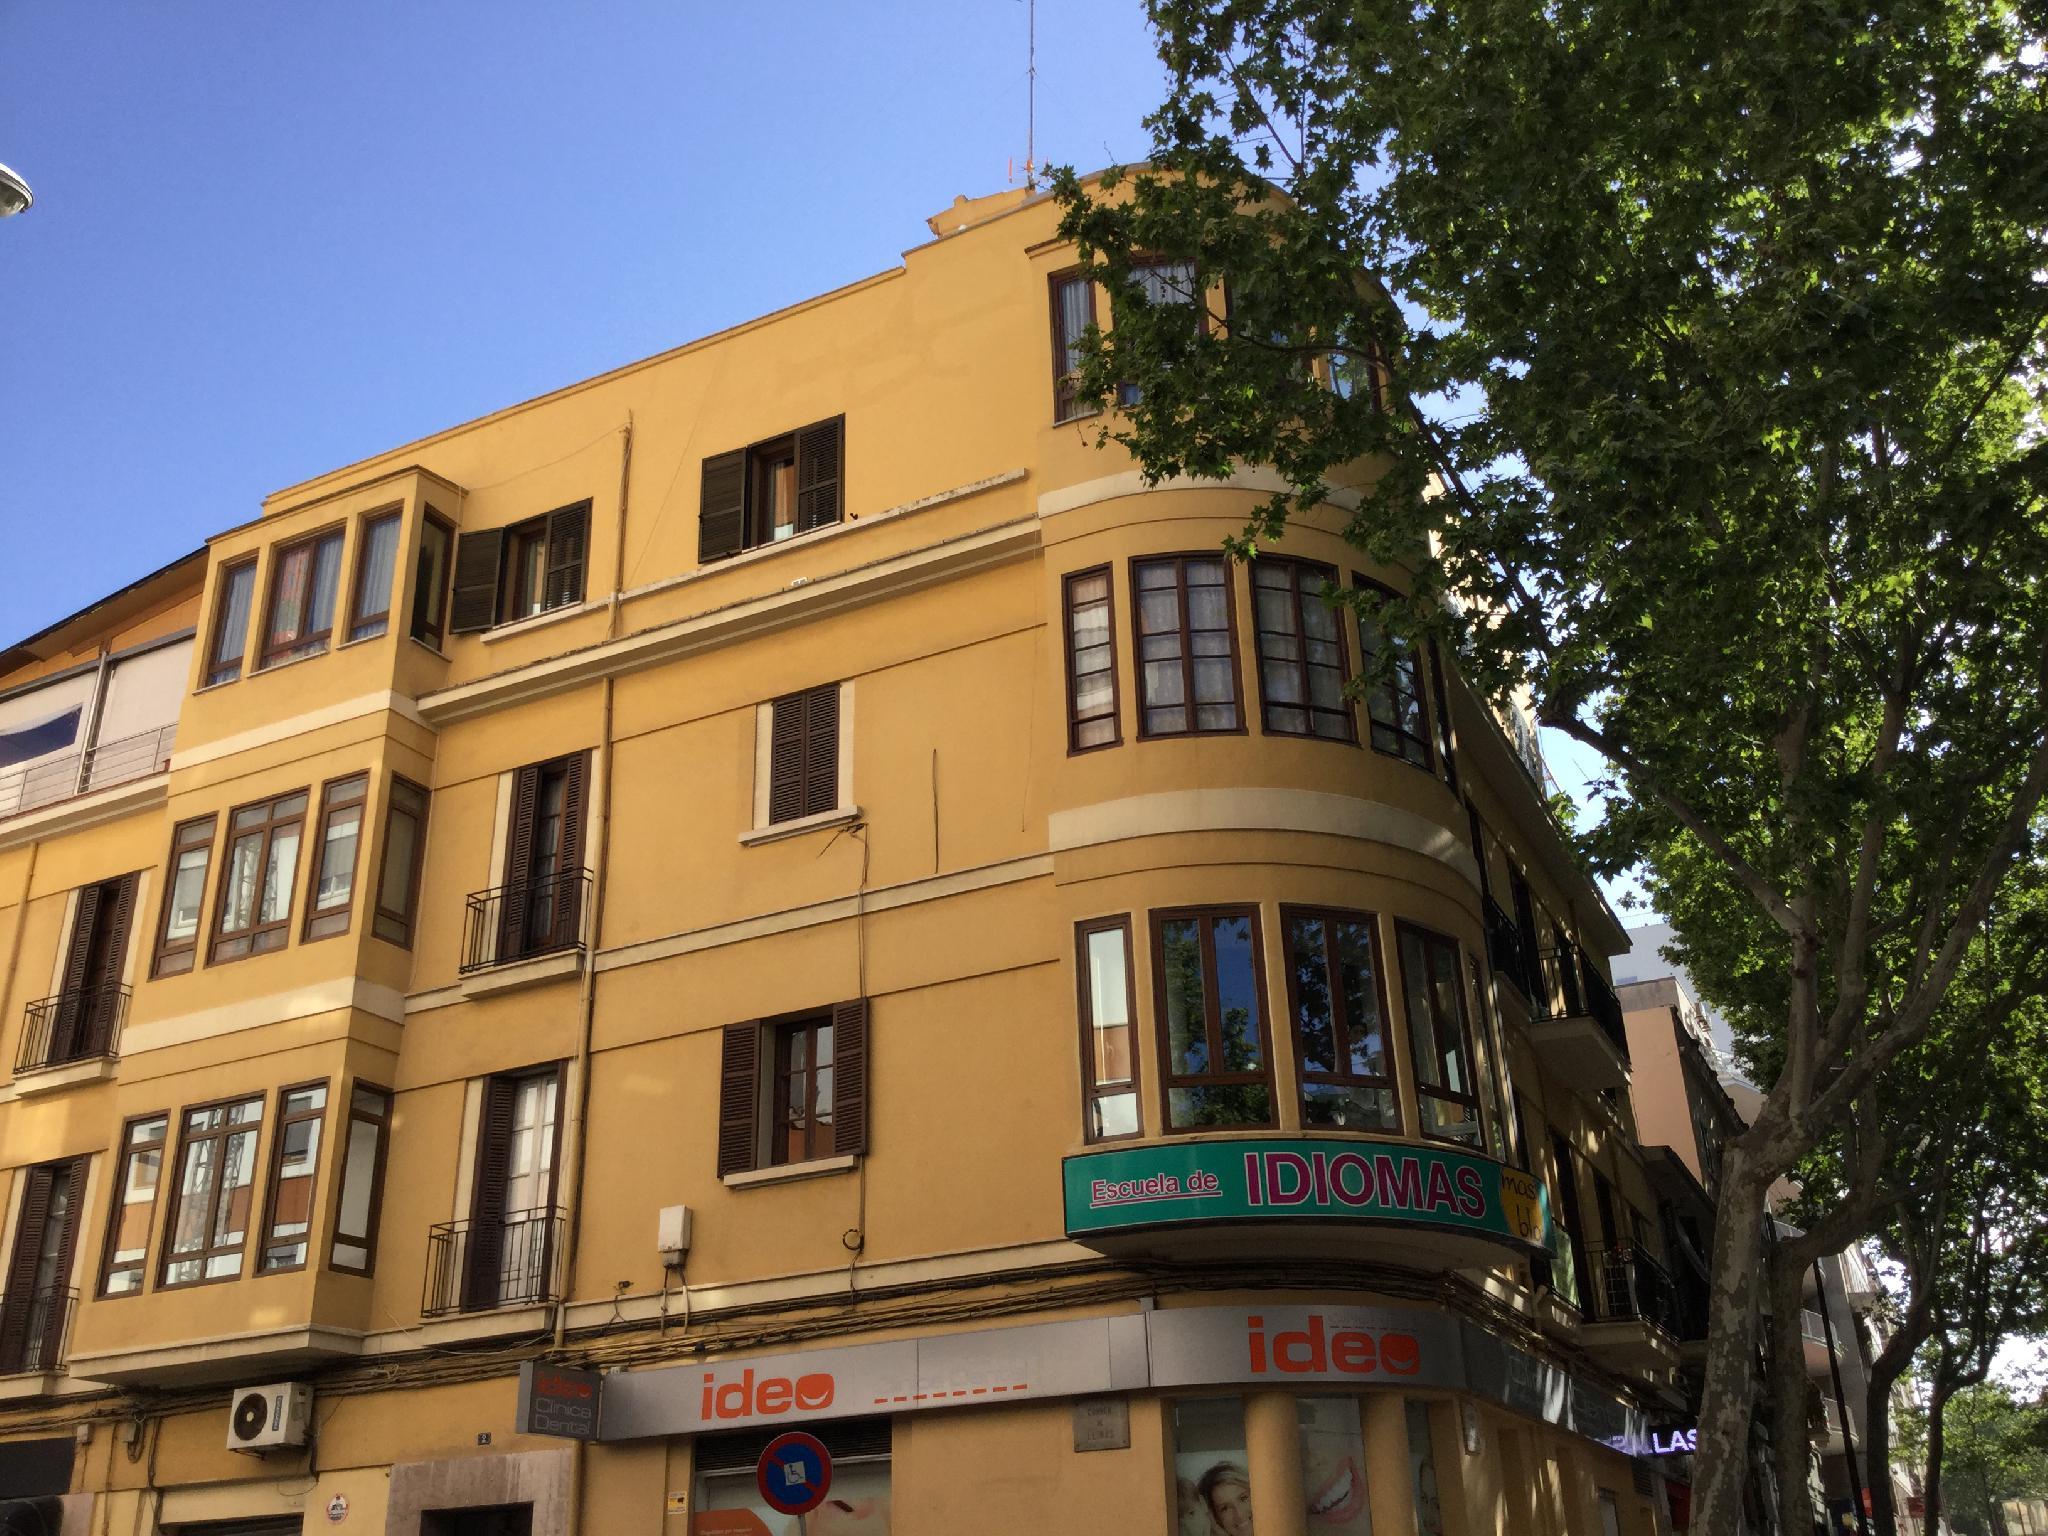 184390 - Calle Marqués de la Cenia